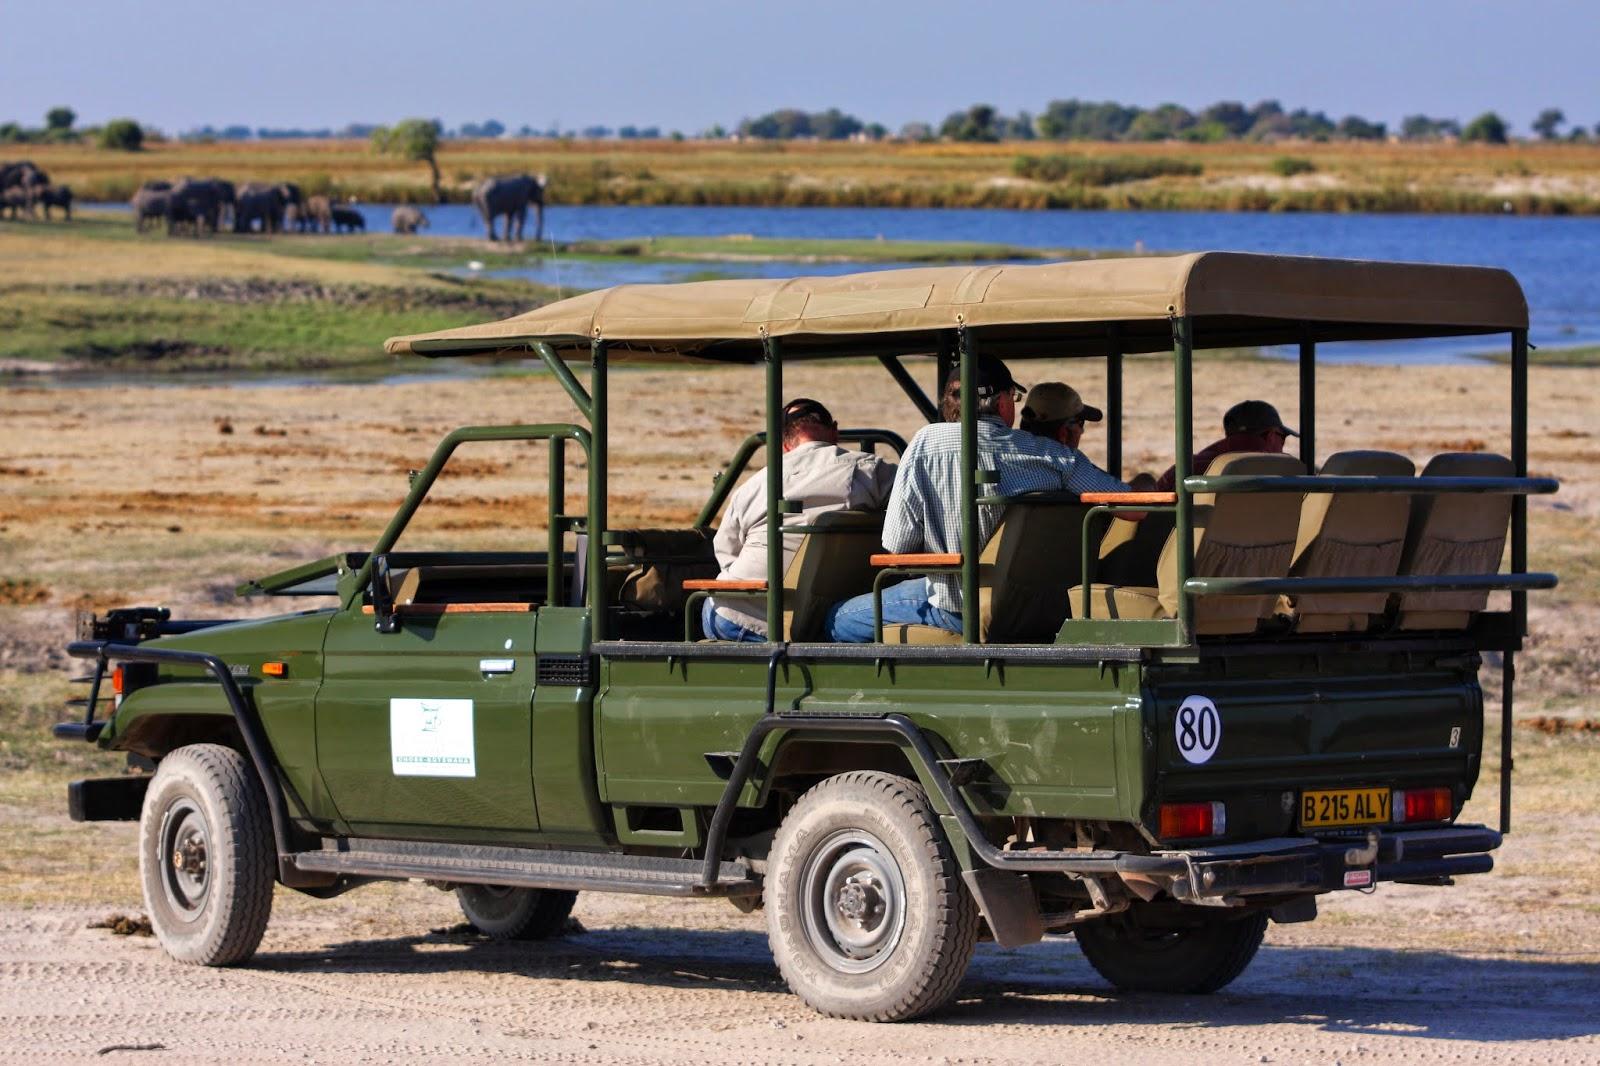 Elephant Valley Lodge Chobe, Botswana